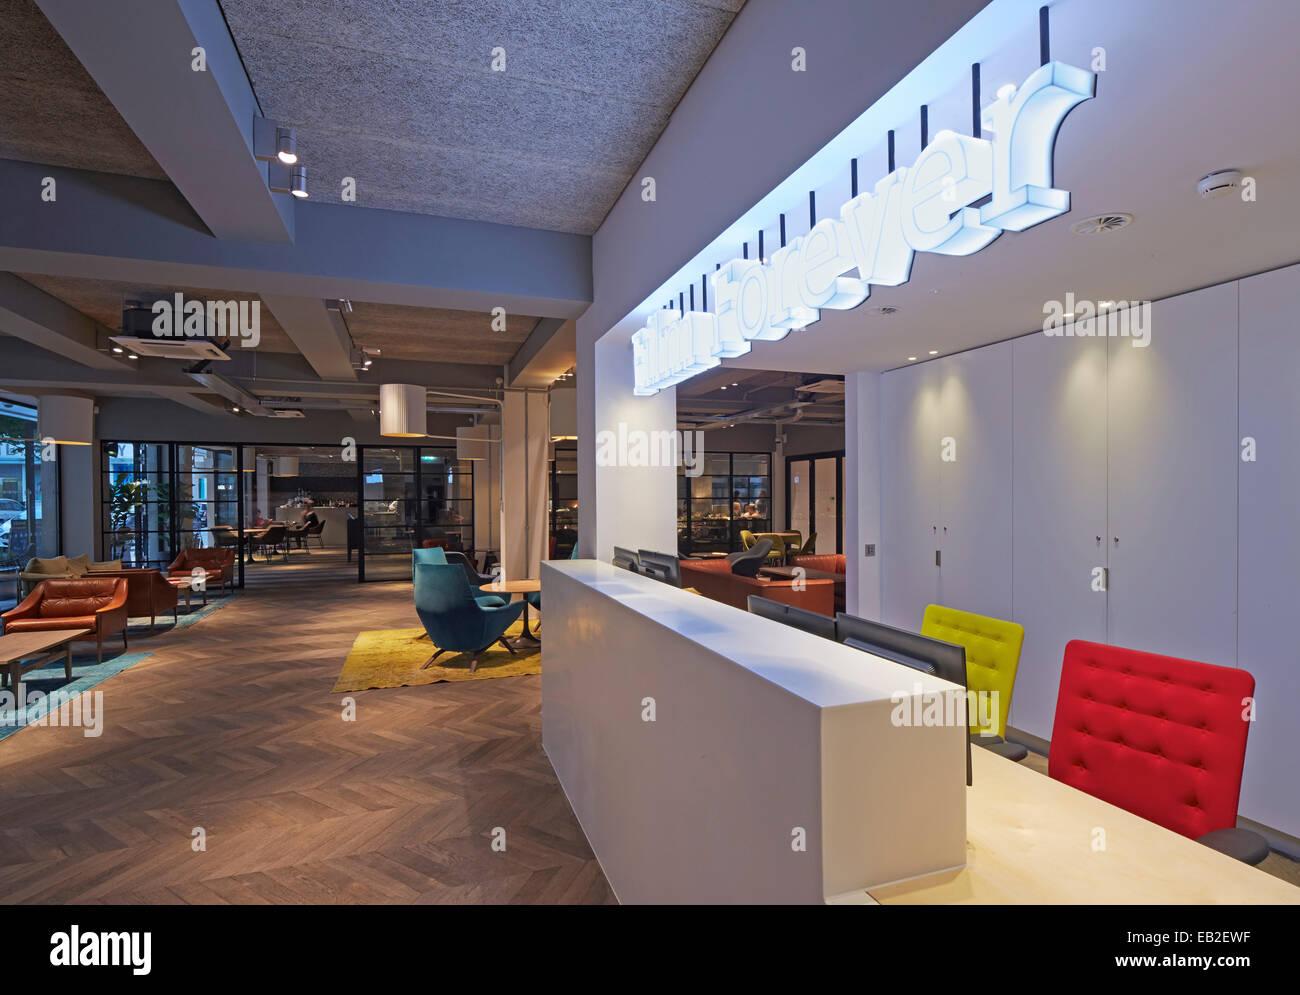 BRITISH FILM INSTITUTE (BFI), London, United Kingdom. Architect: Ben Adams Architects, 2014. Interior view with - Stock Image